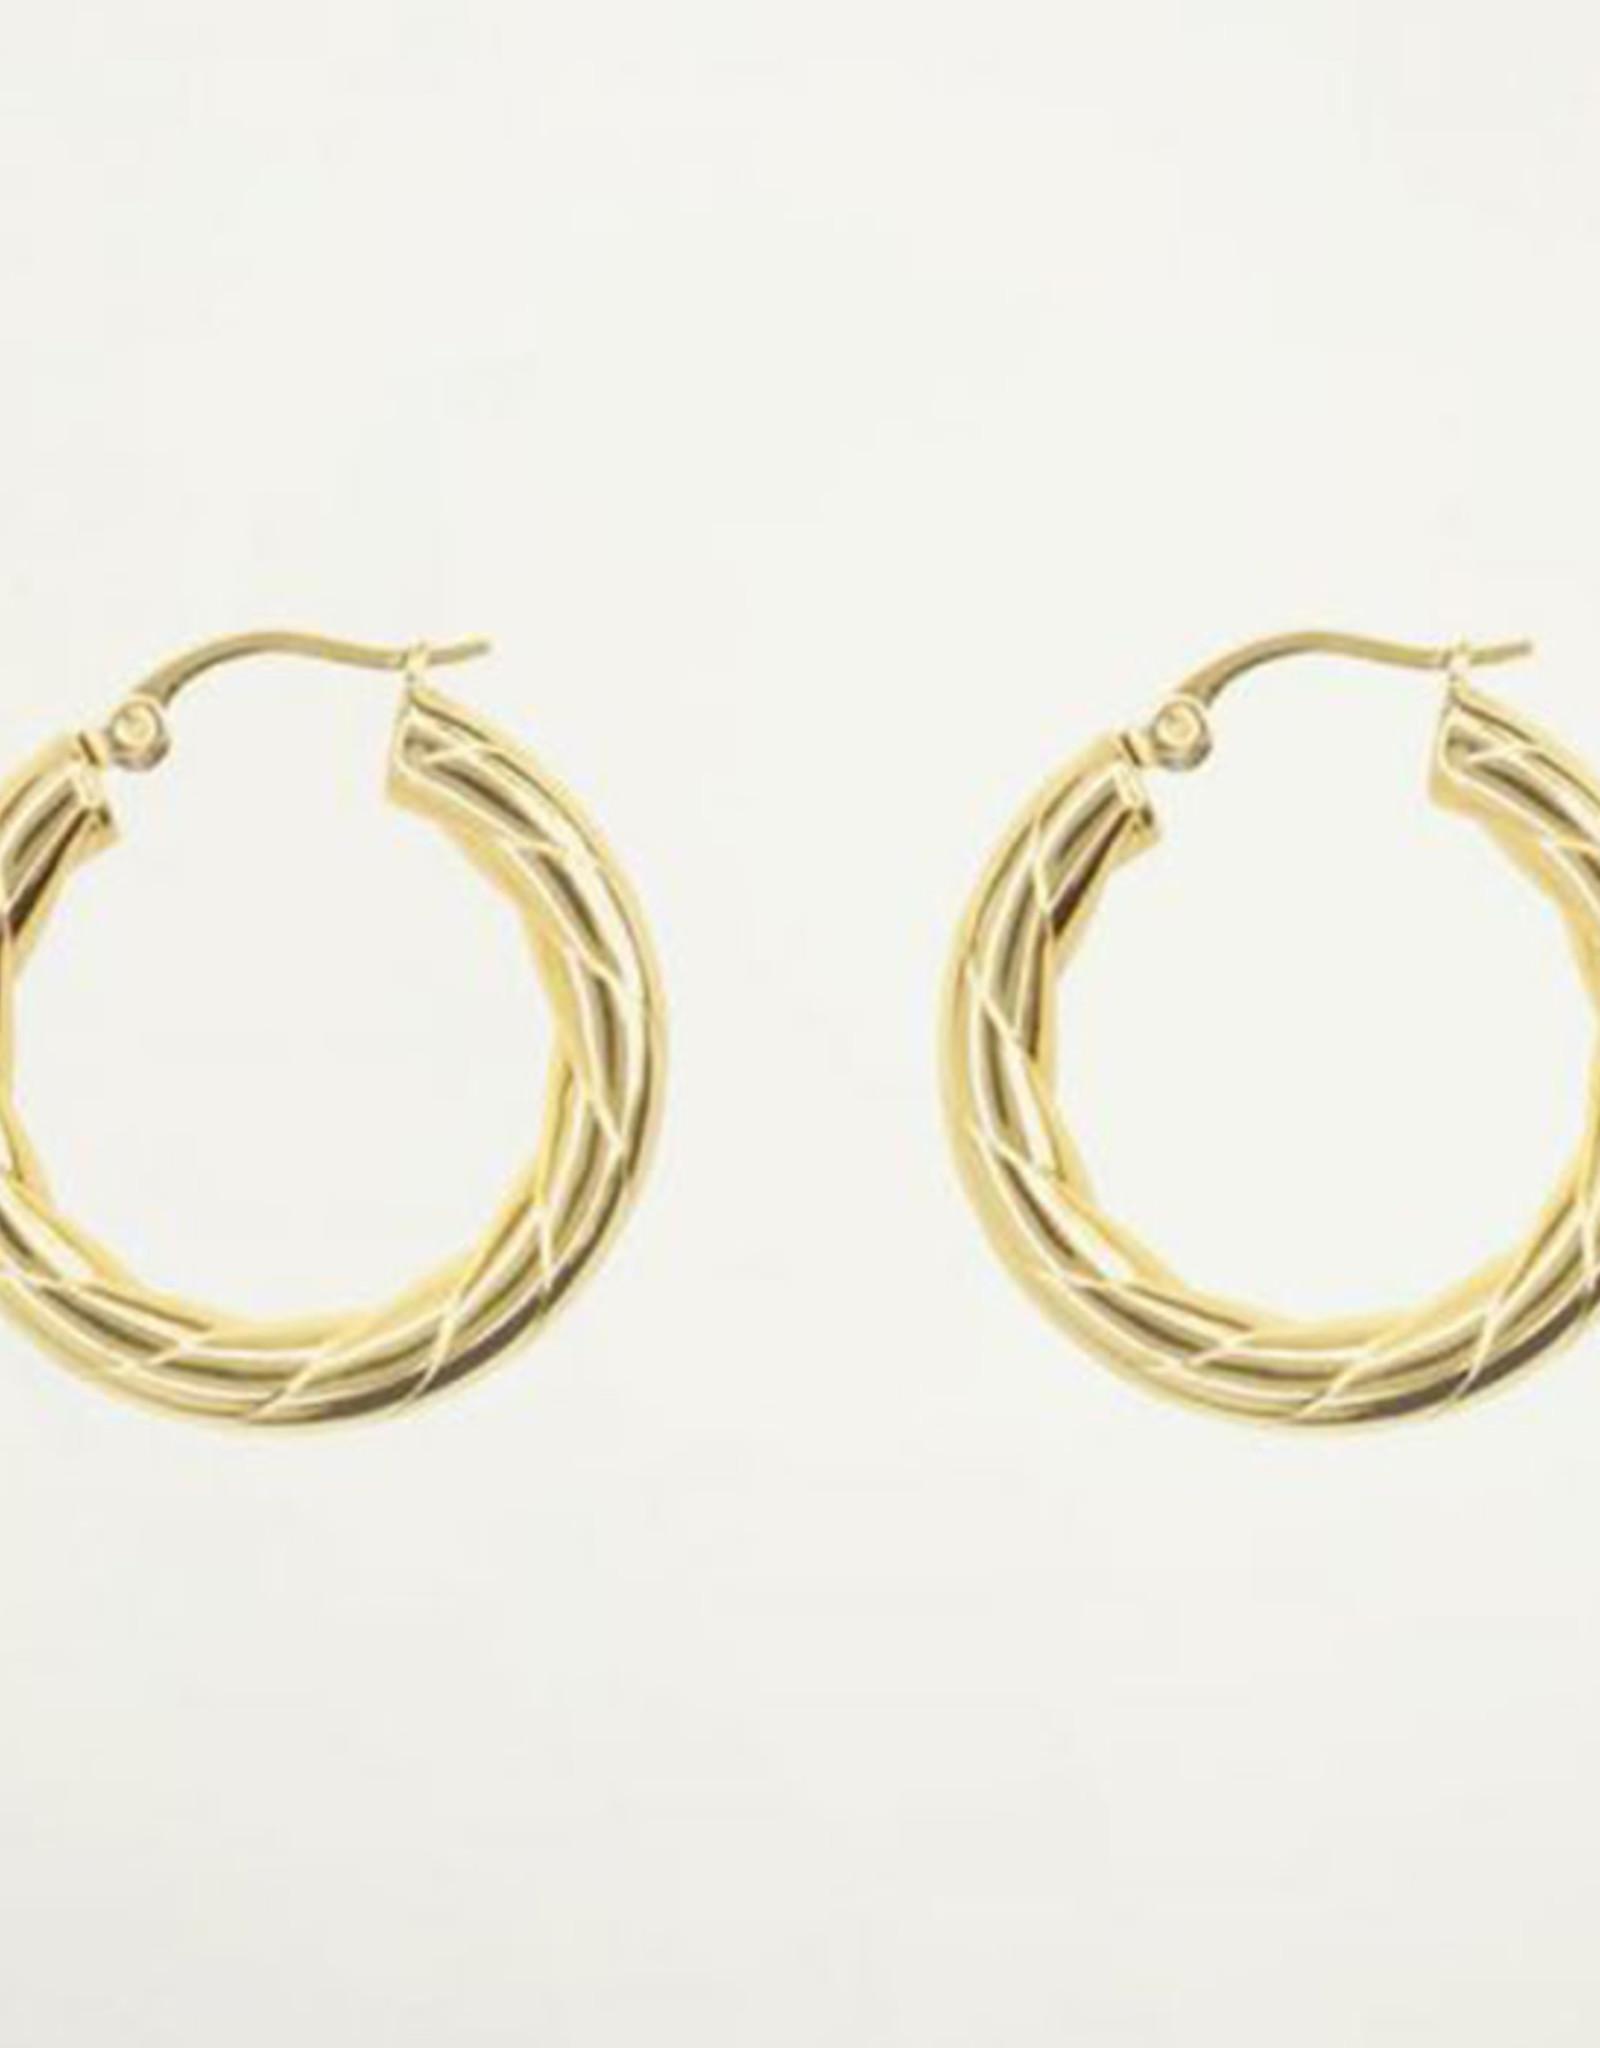 My Jewelry Oorbellen Creole gedraaid large-gold